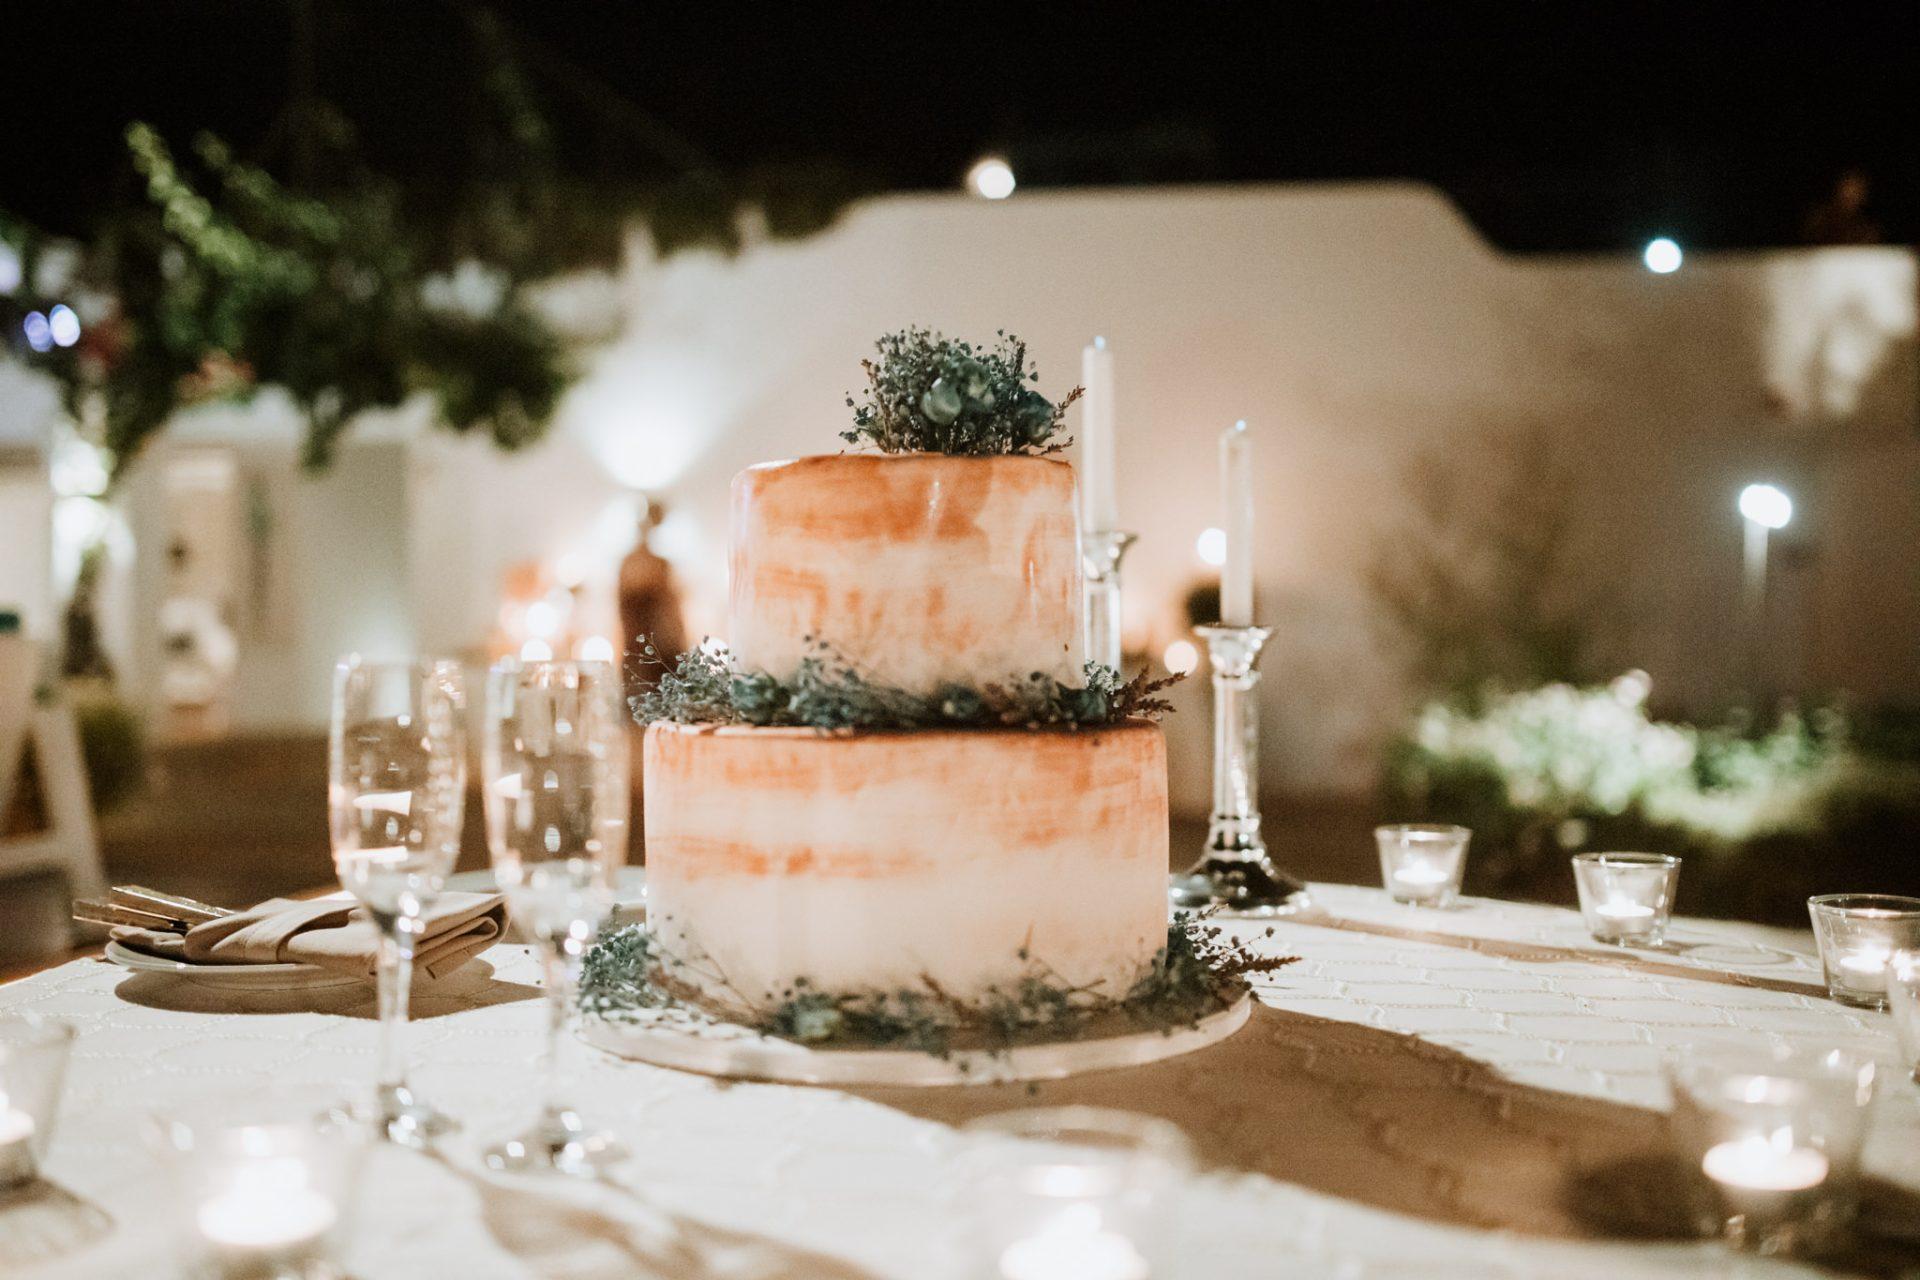 wedding cake white and orange lavender decorations